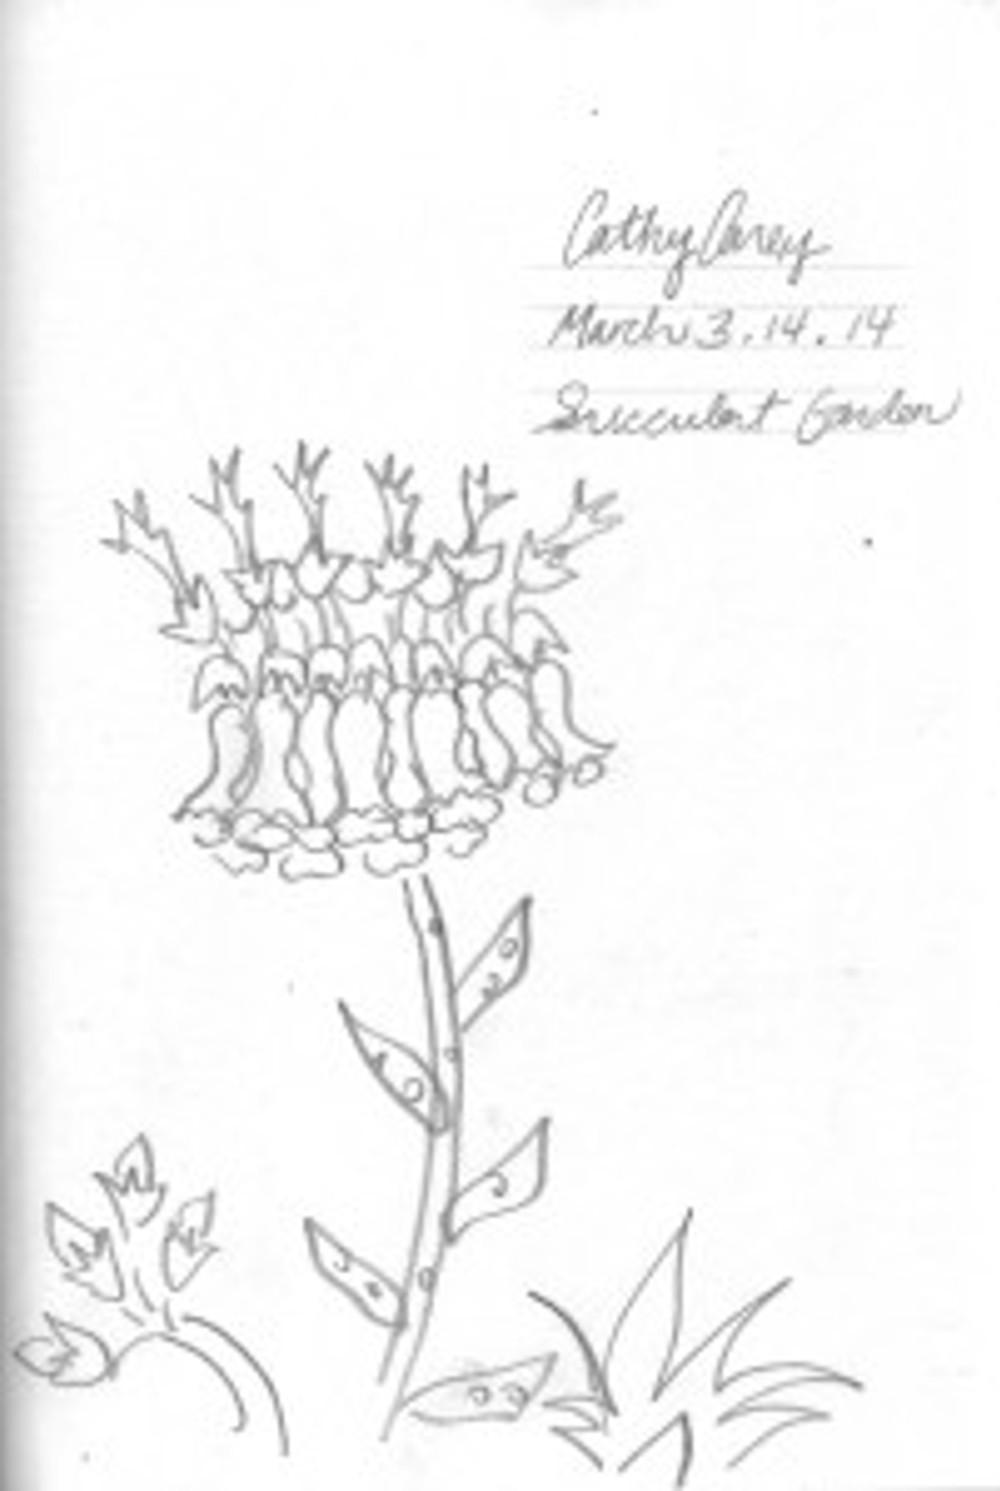 succulent garden p.1